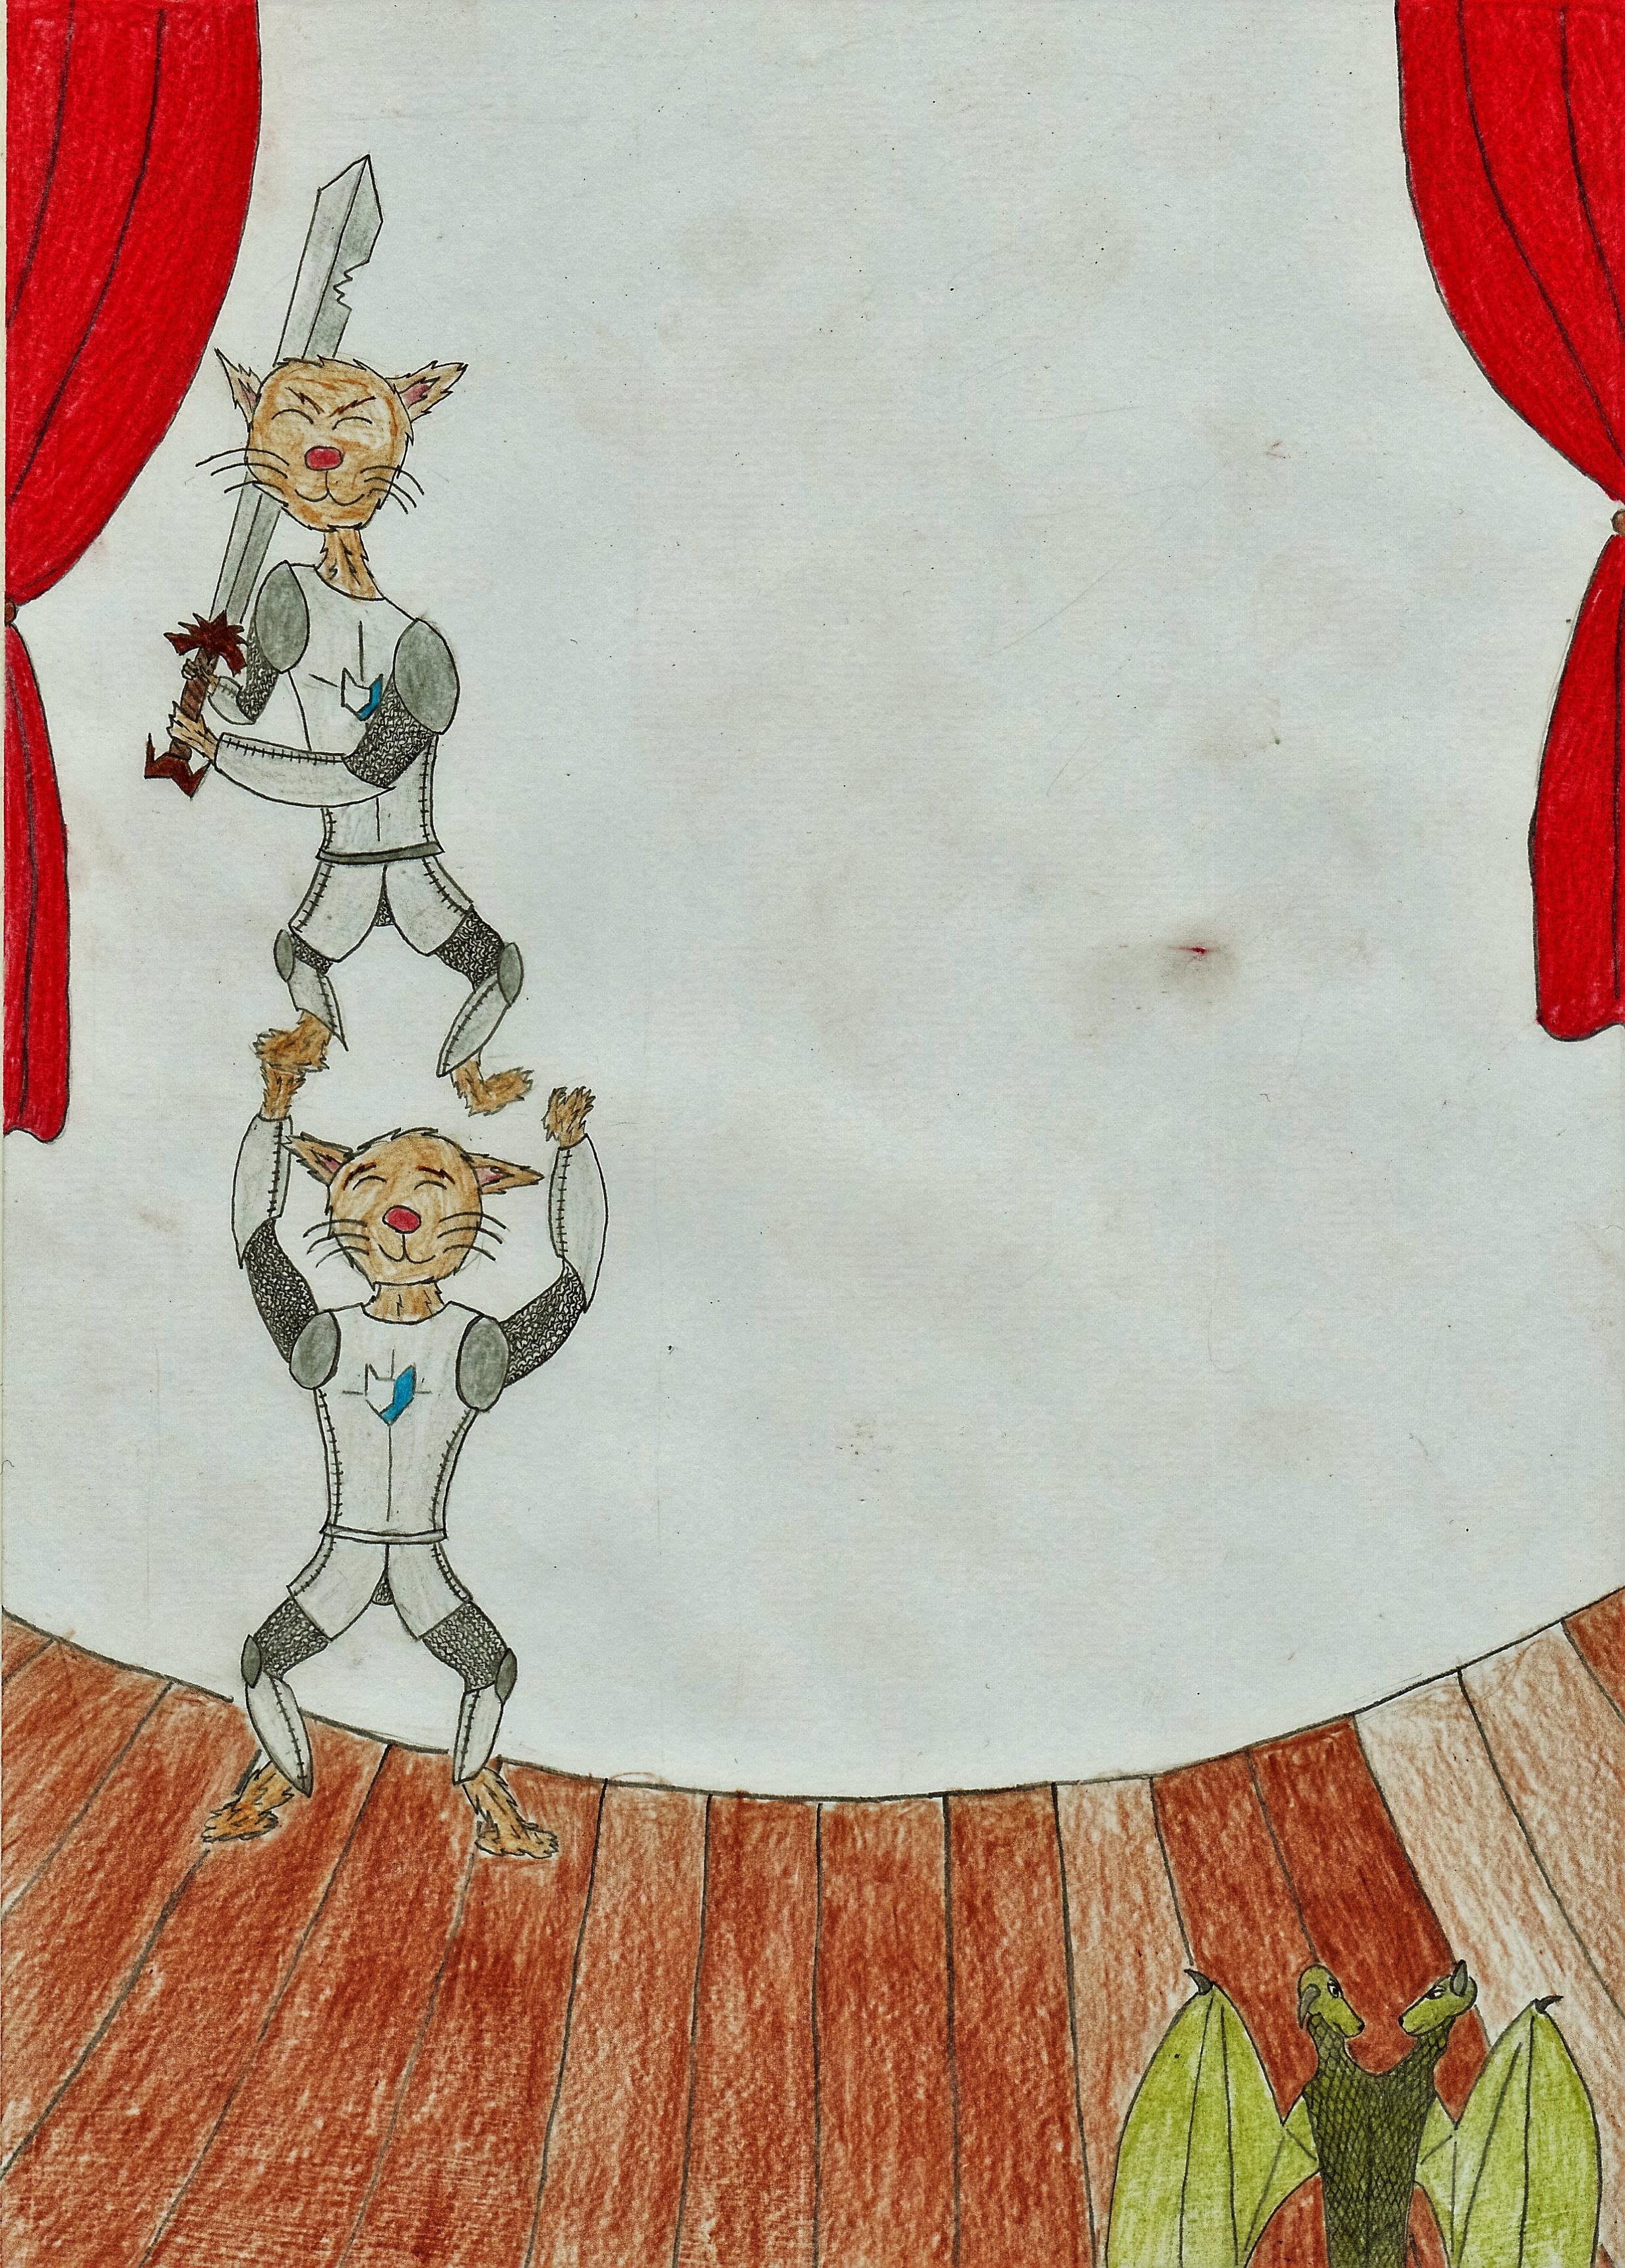 The Twoheaded Hero vs The Twin-Brothers Jackie & Josh